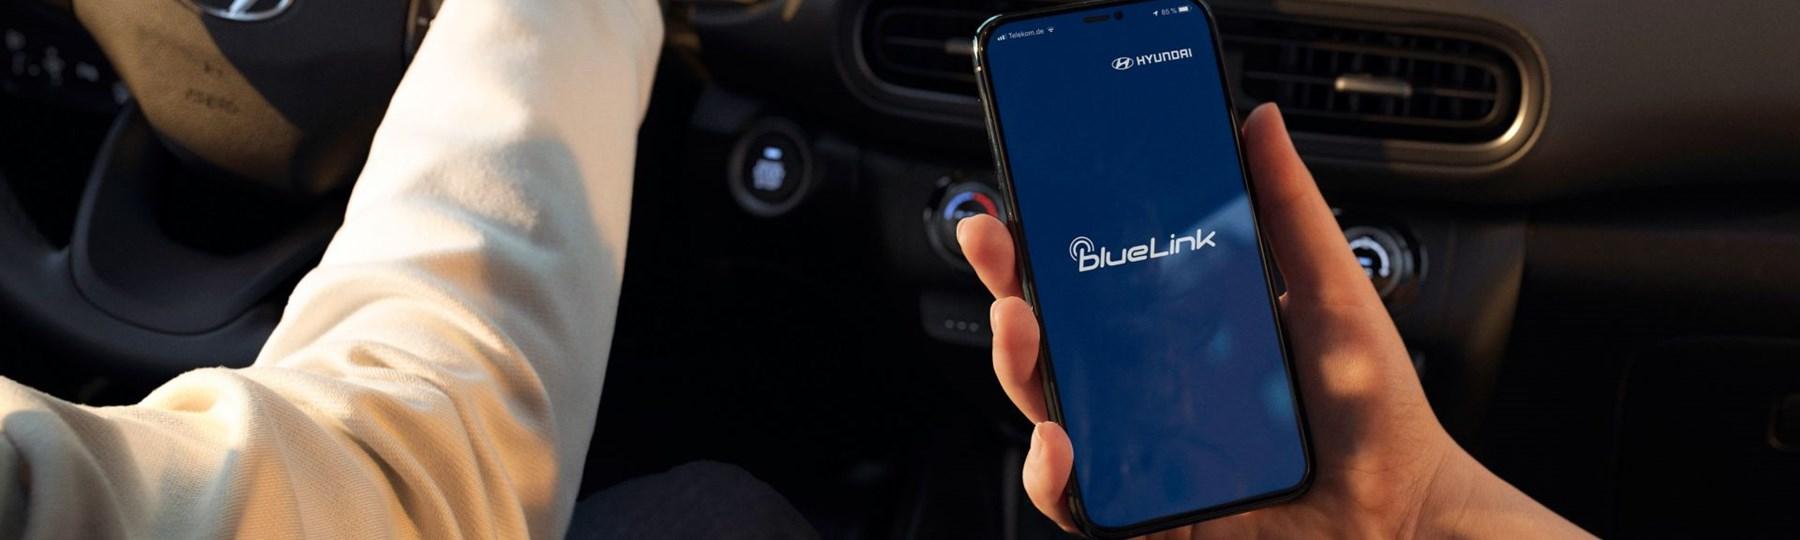 Hyundai Kona HEV Phone-Mirroring 5x4